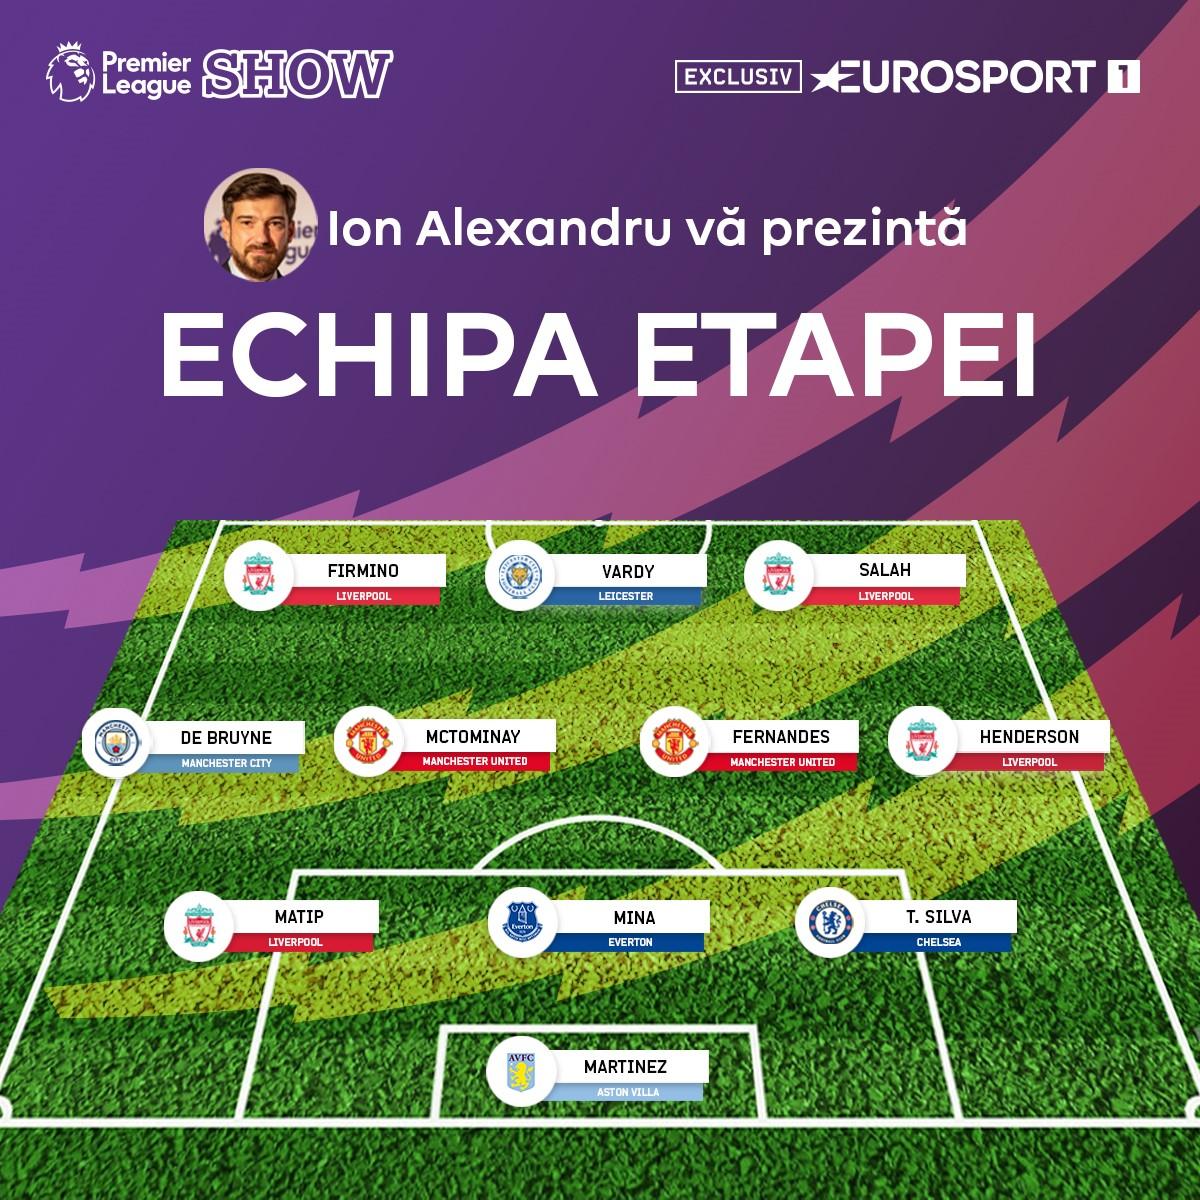 https://i.eurosport.com/2020/12/22/2959882.jpg